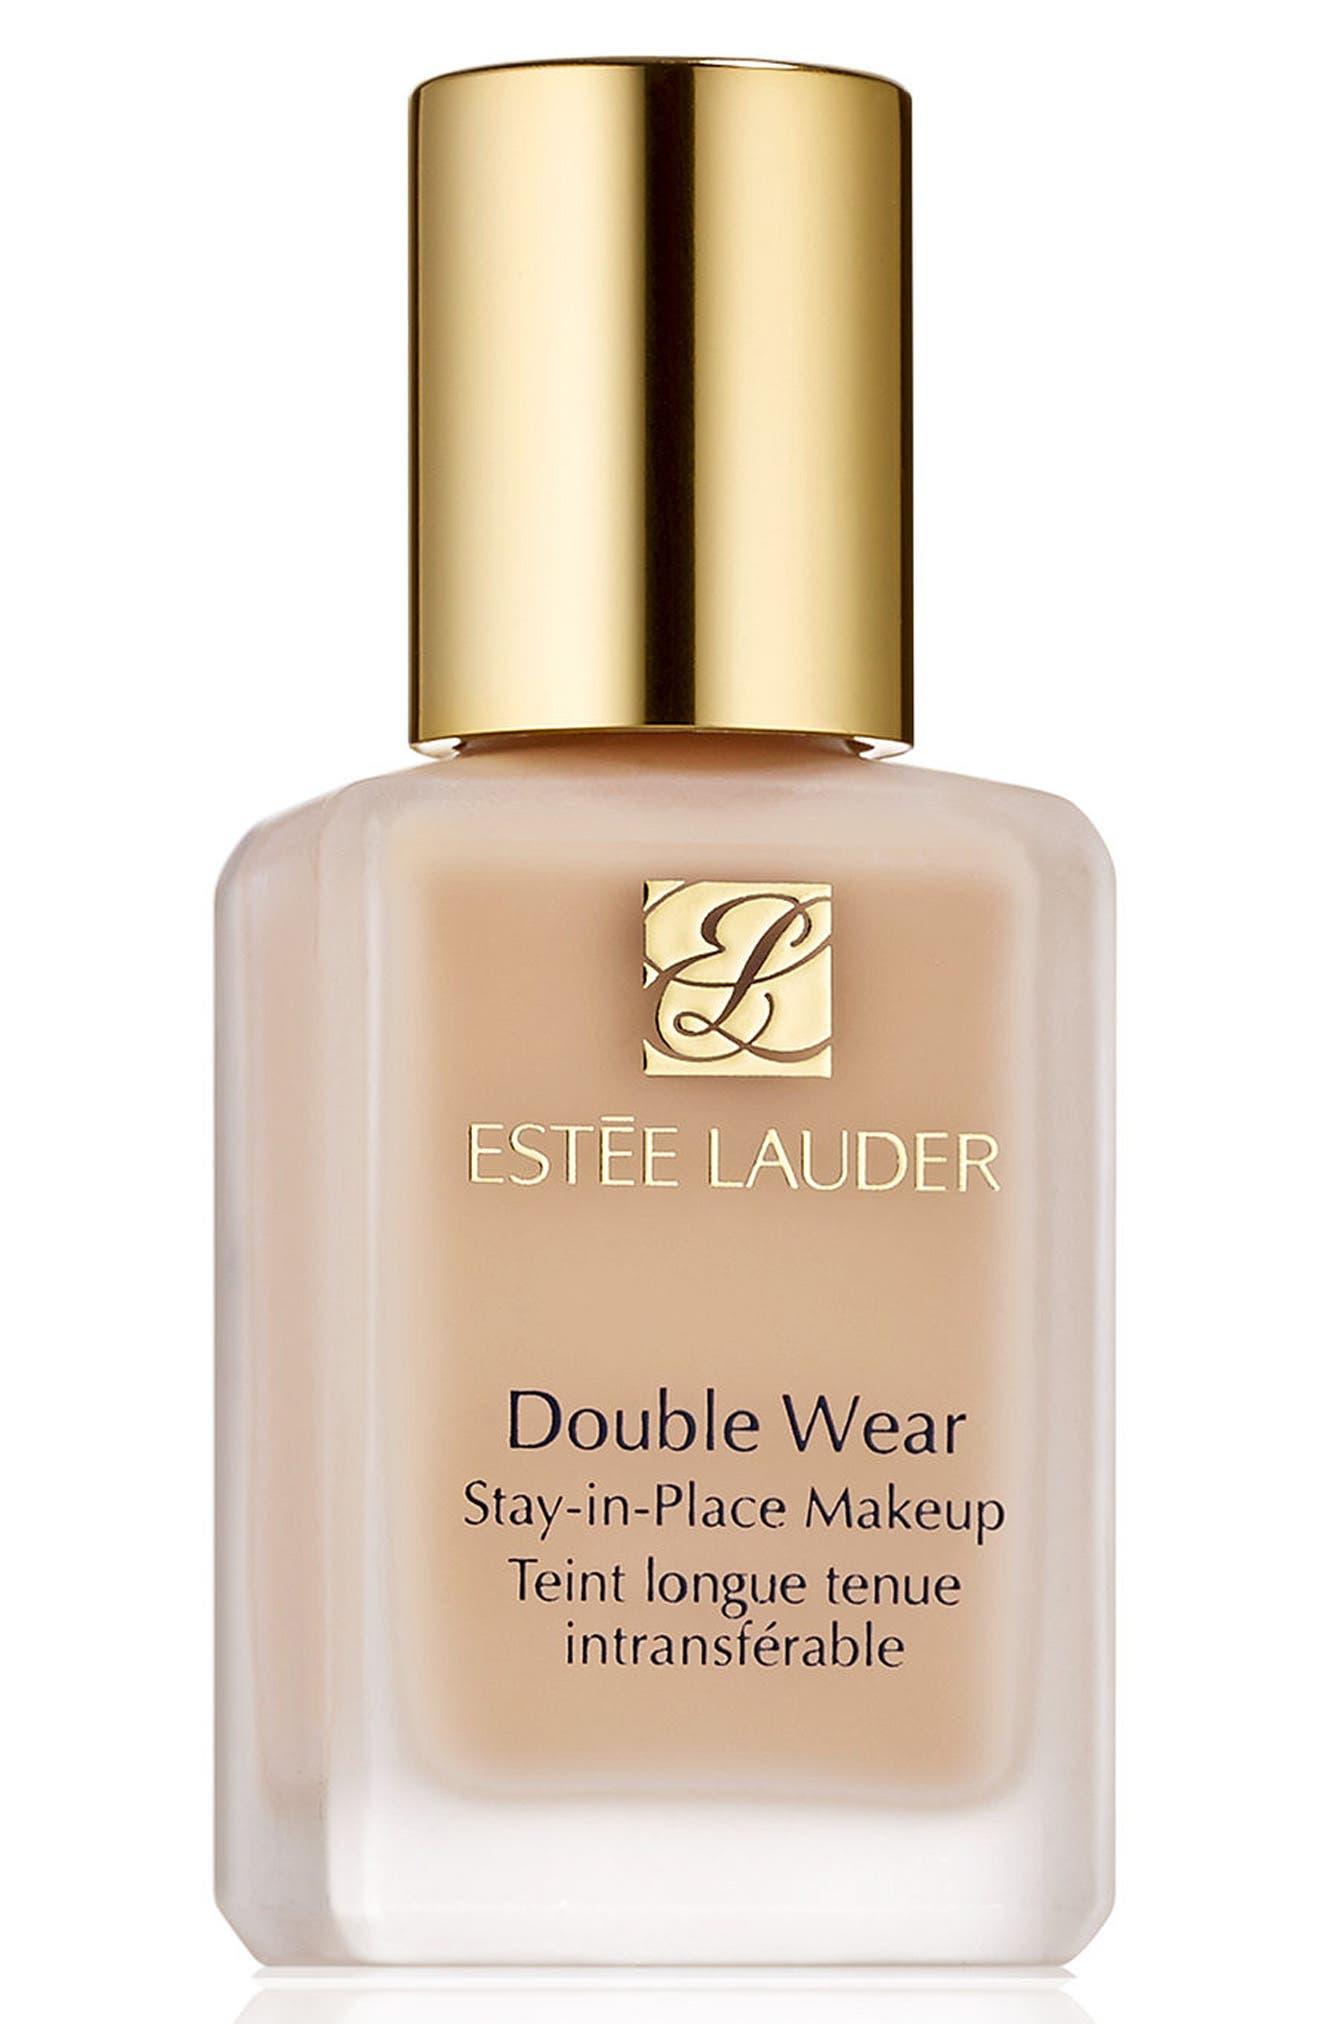 Estee Lauder Double Wear Stay-In-Place Liquid Makeup - 1C1 Cool Bone